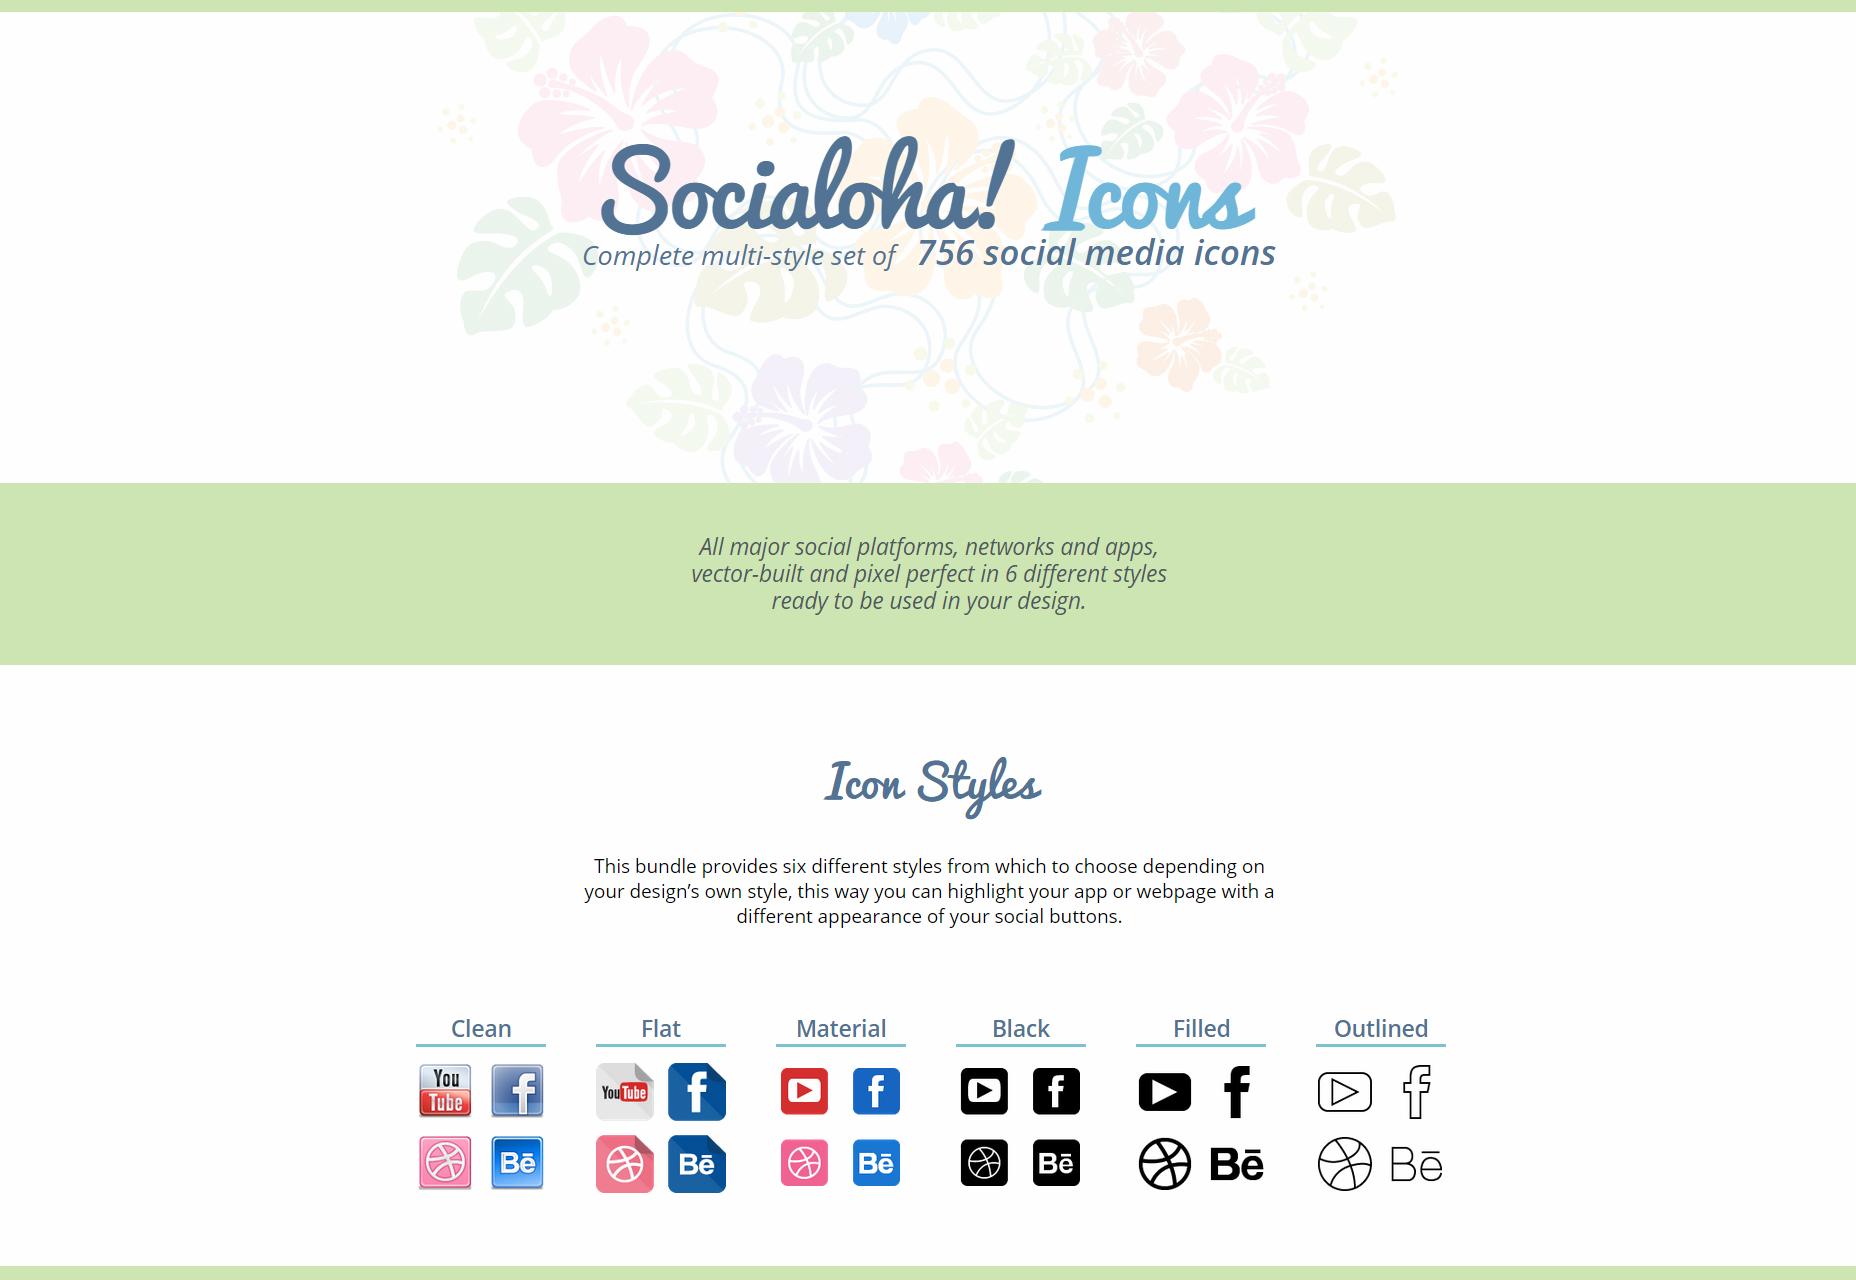 socialoha-a-set-of-756-multi-styled-social-icons